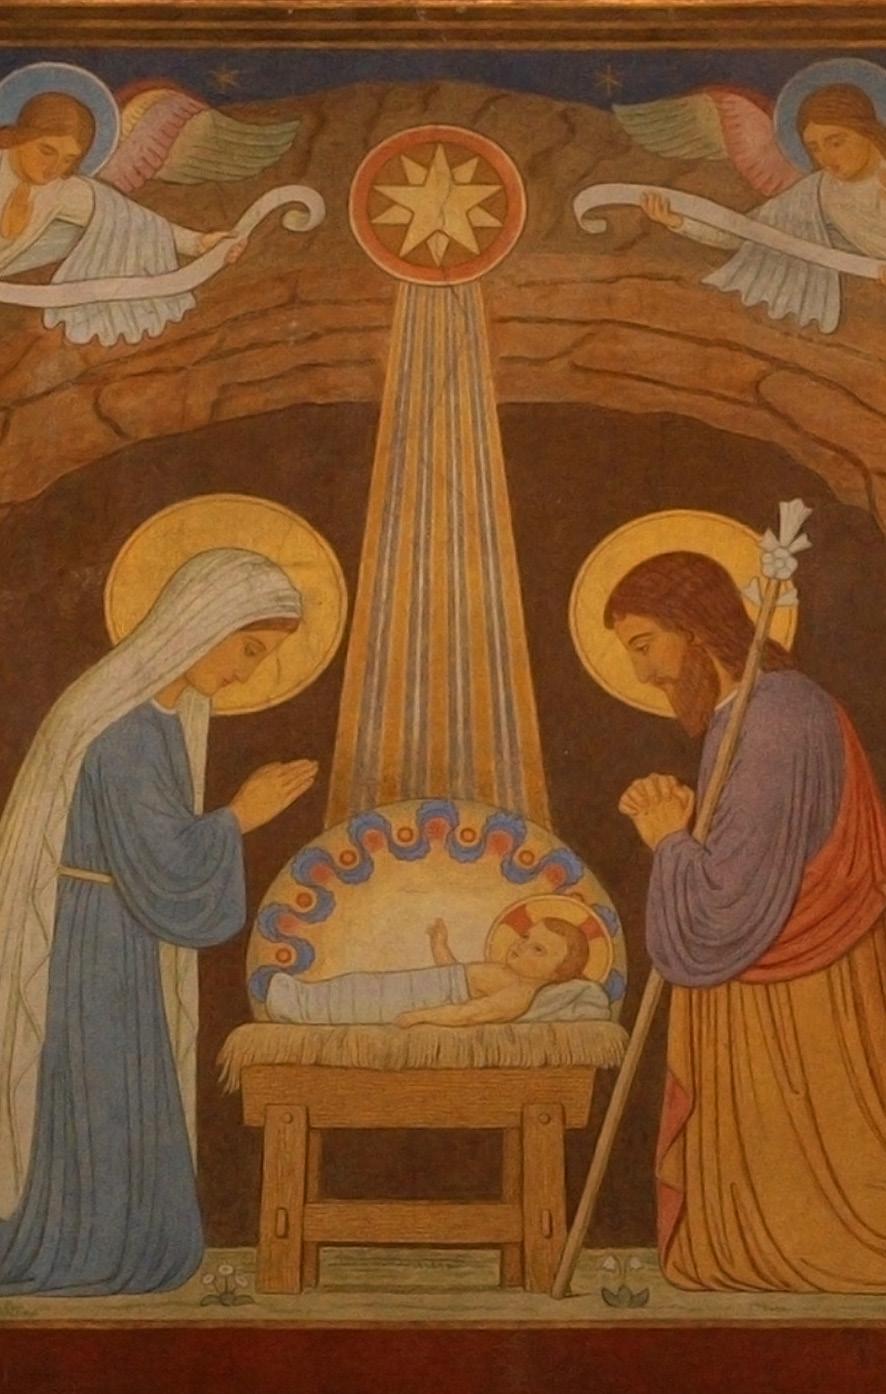 Bildchen - Menschwerdung Christi